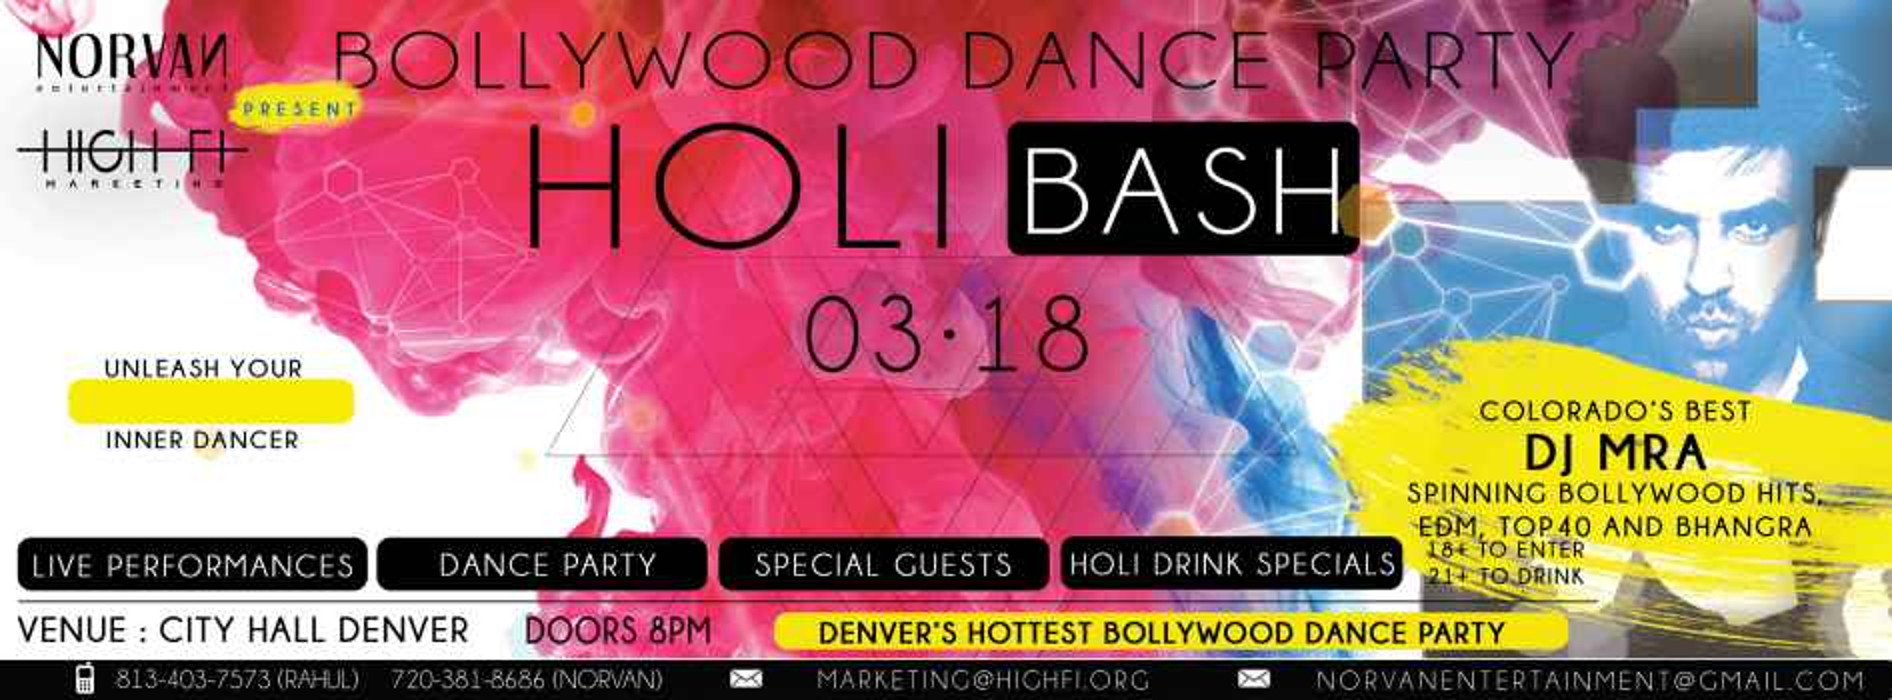 Bollywood Dance Party 2017 Denver